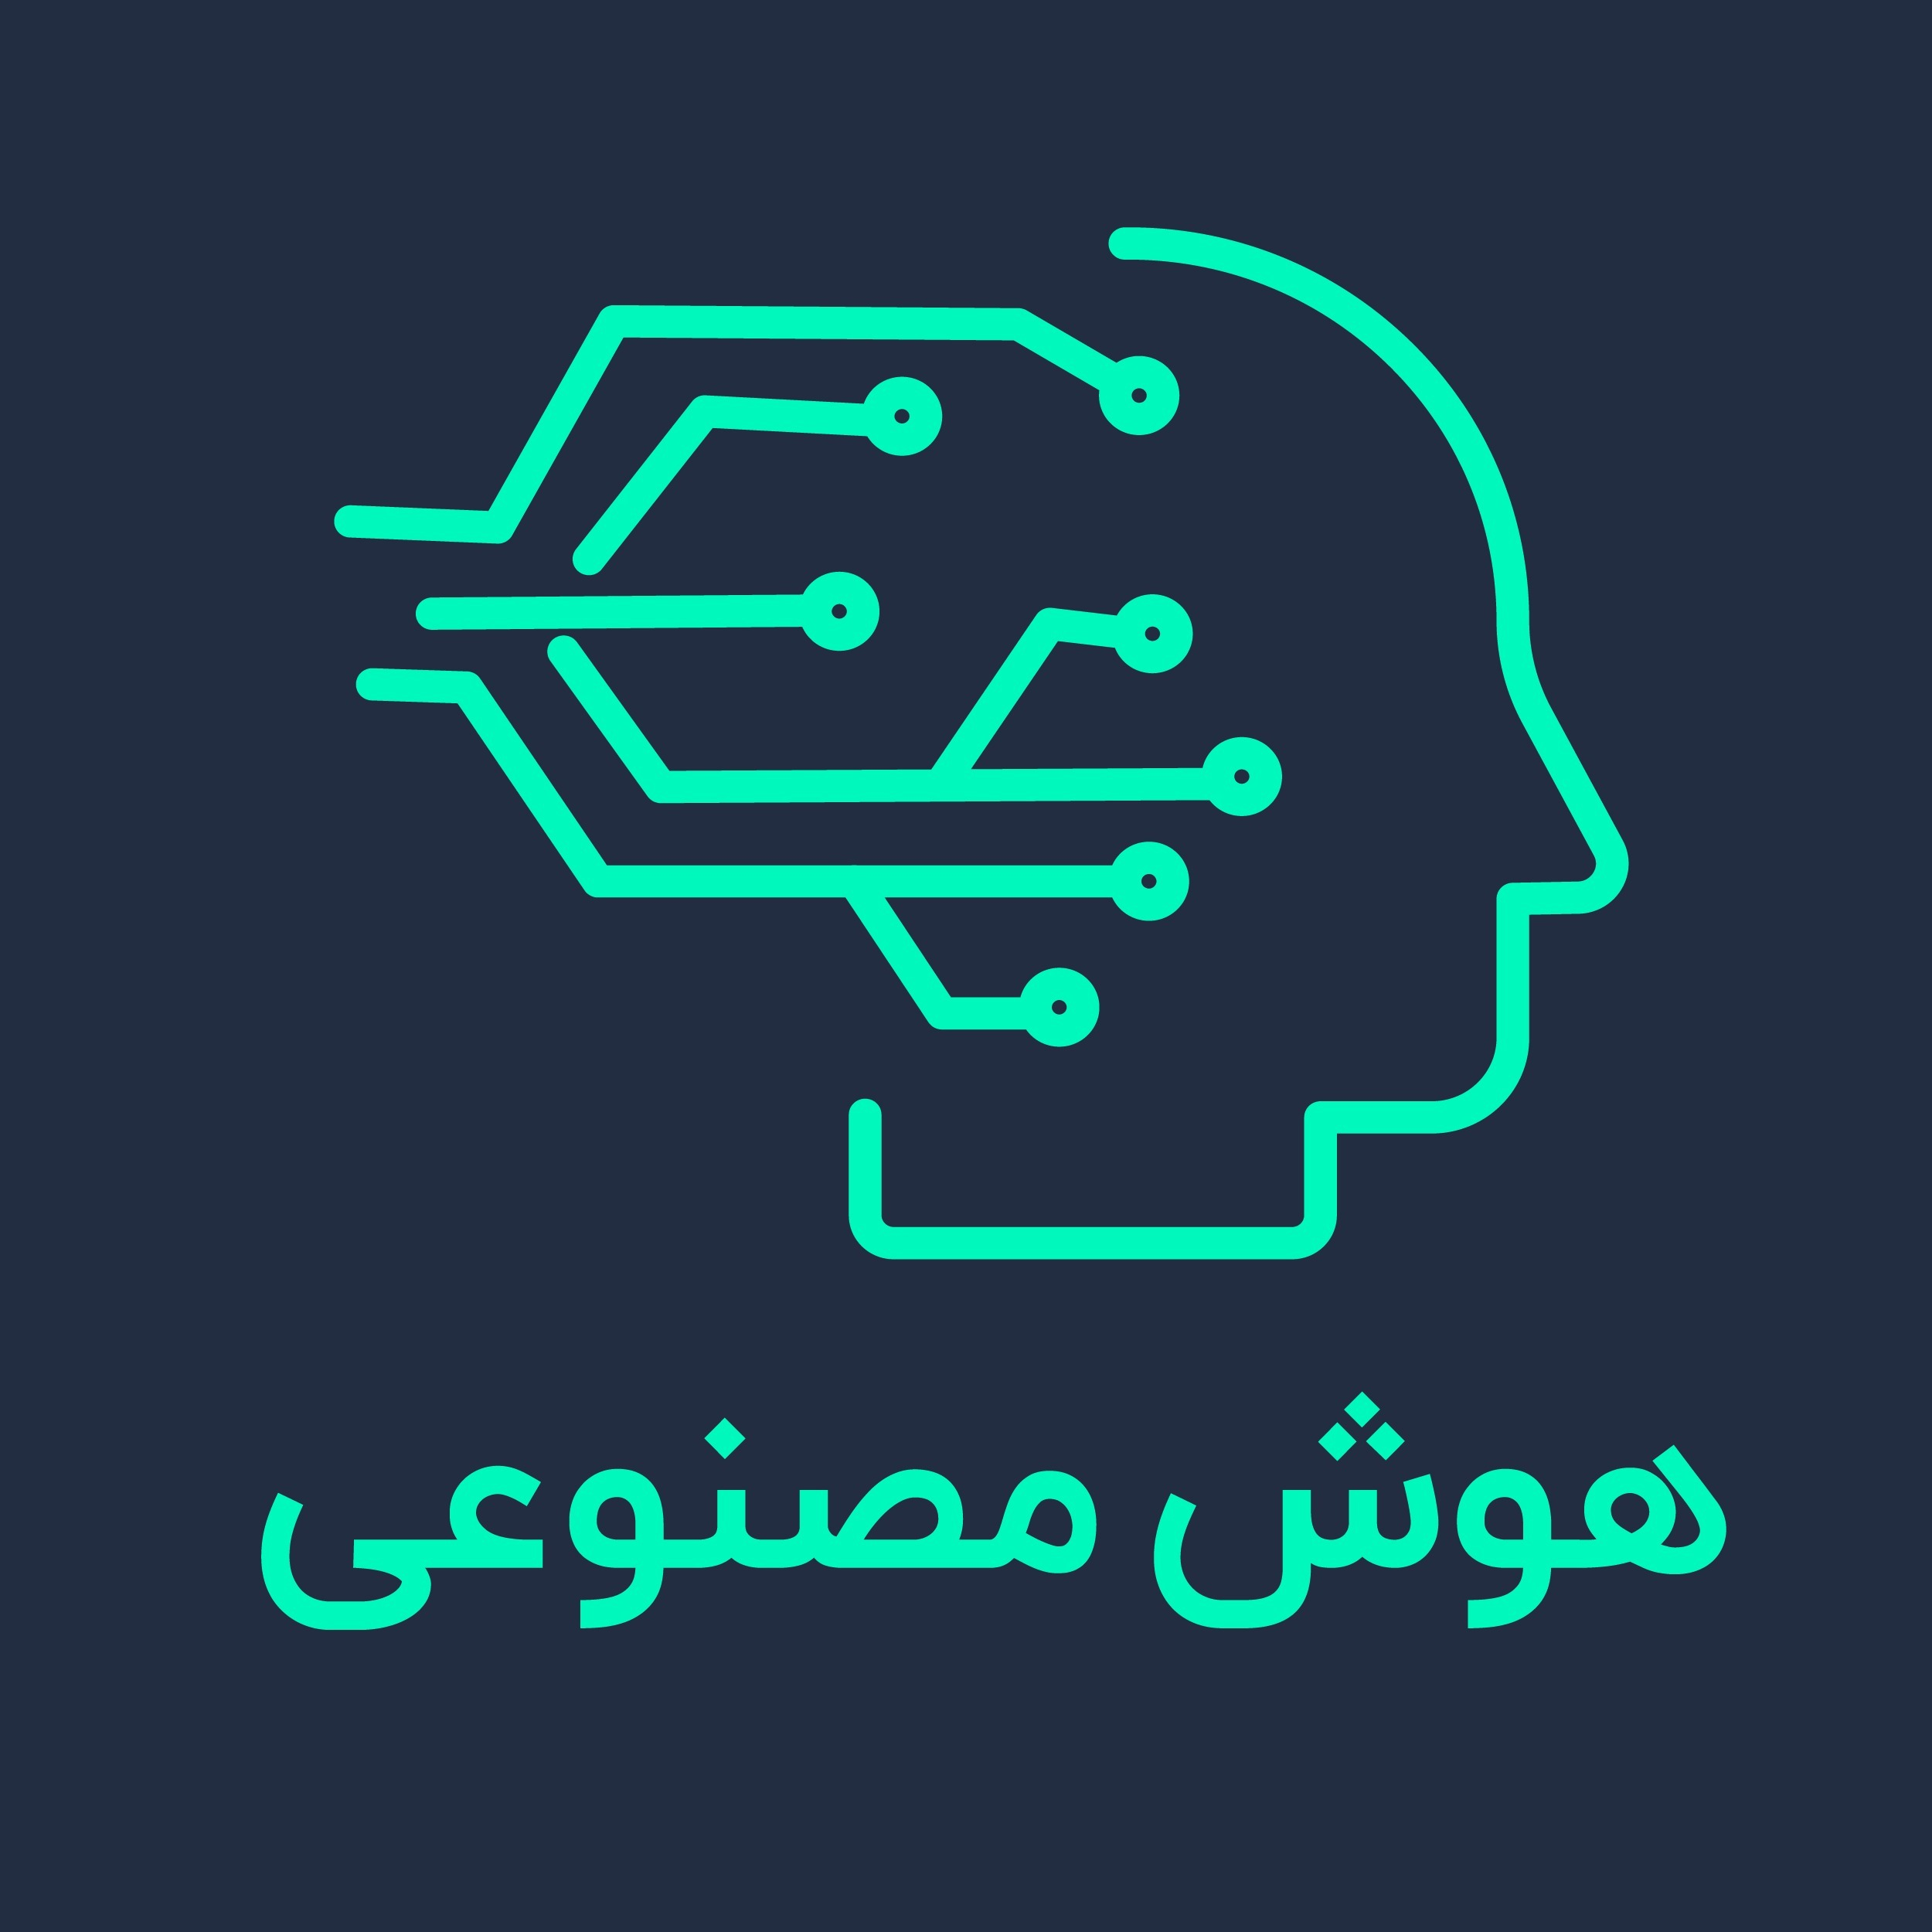 هوش مصنوعی در کسب و کار — بخش سوم: بایدو